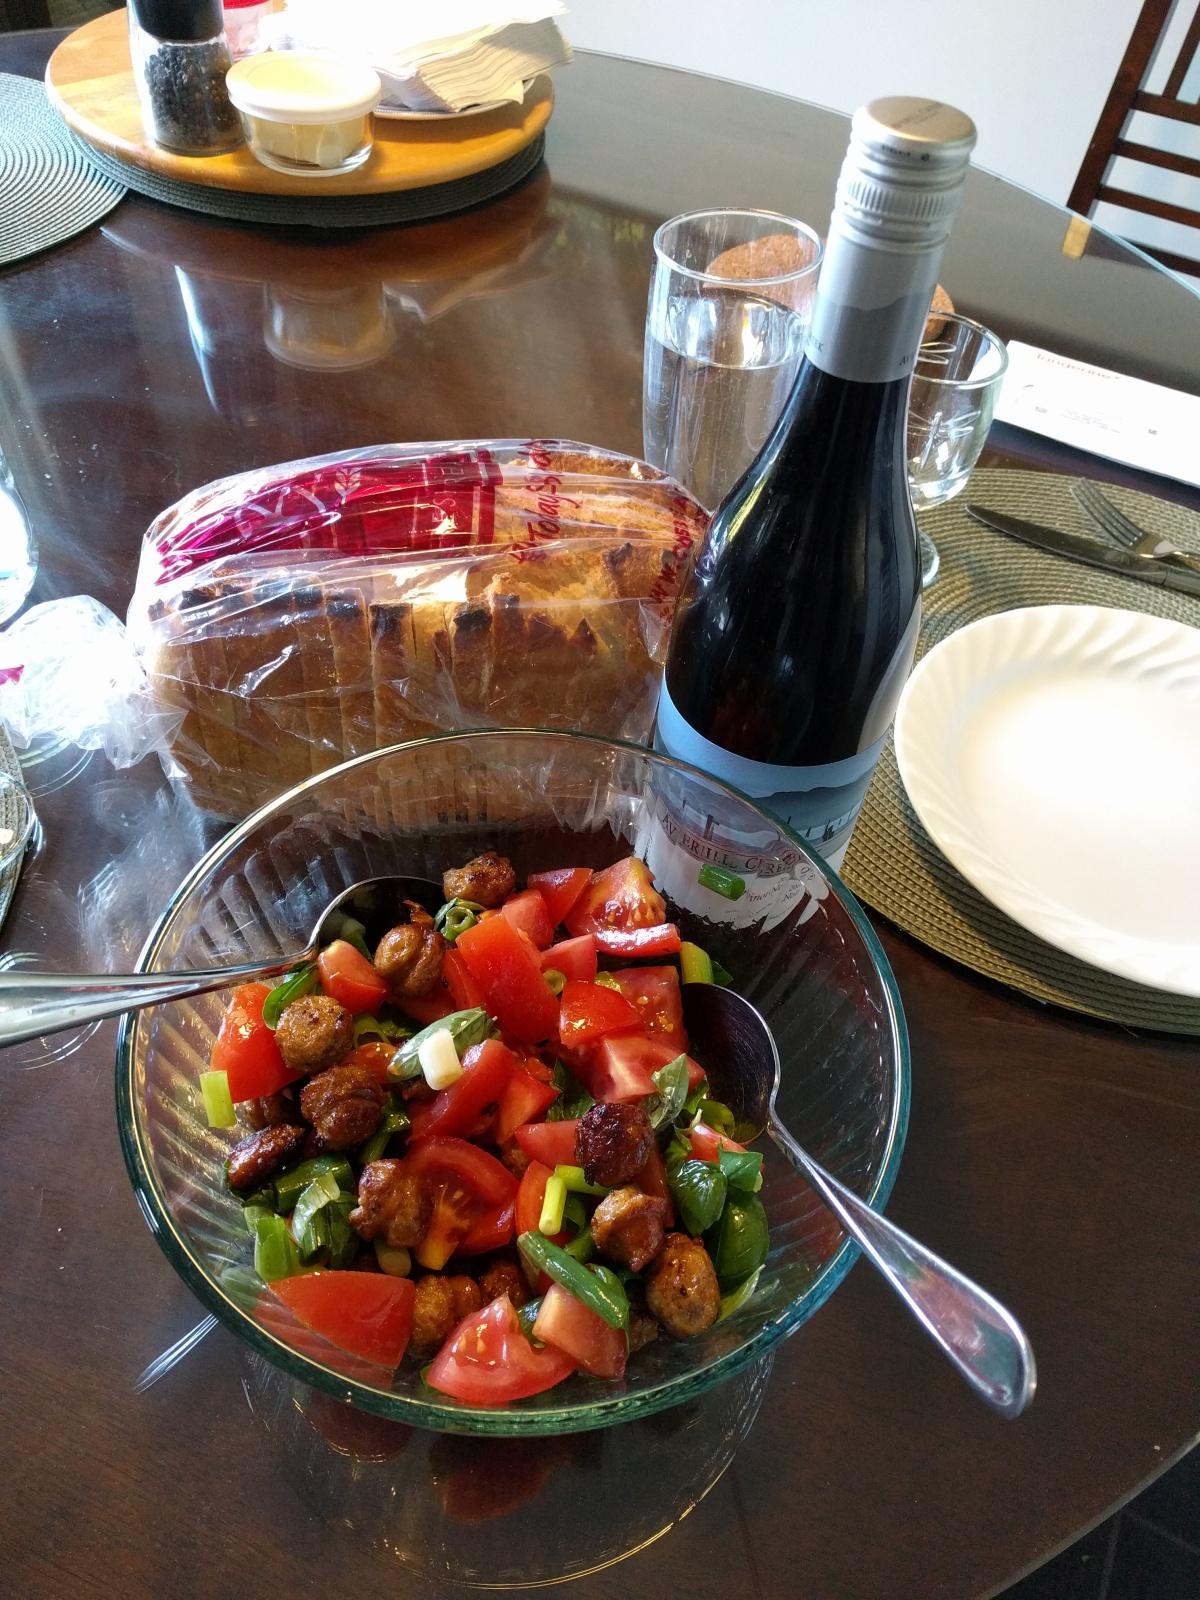 A Tomato Chorizo Salad to DieFor